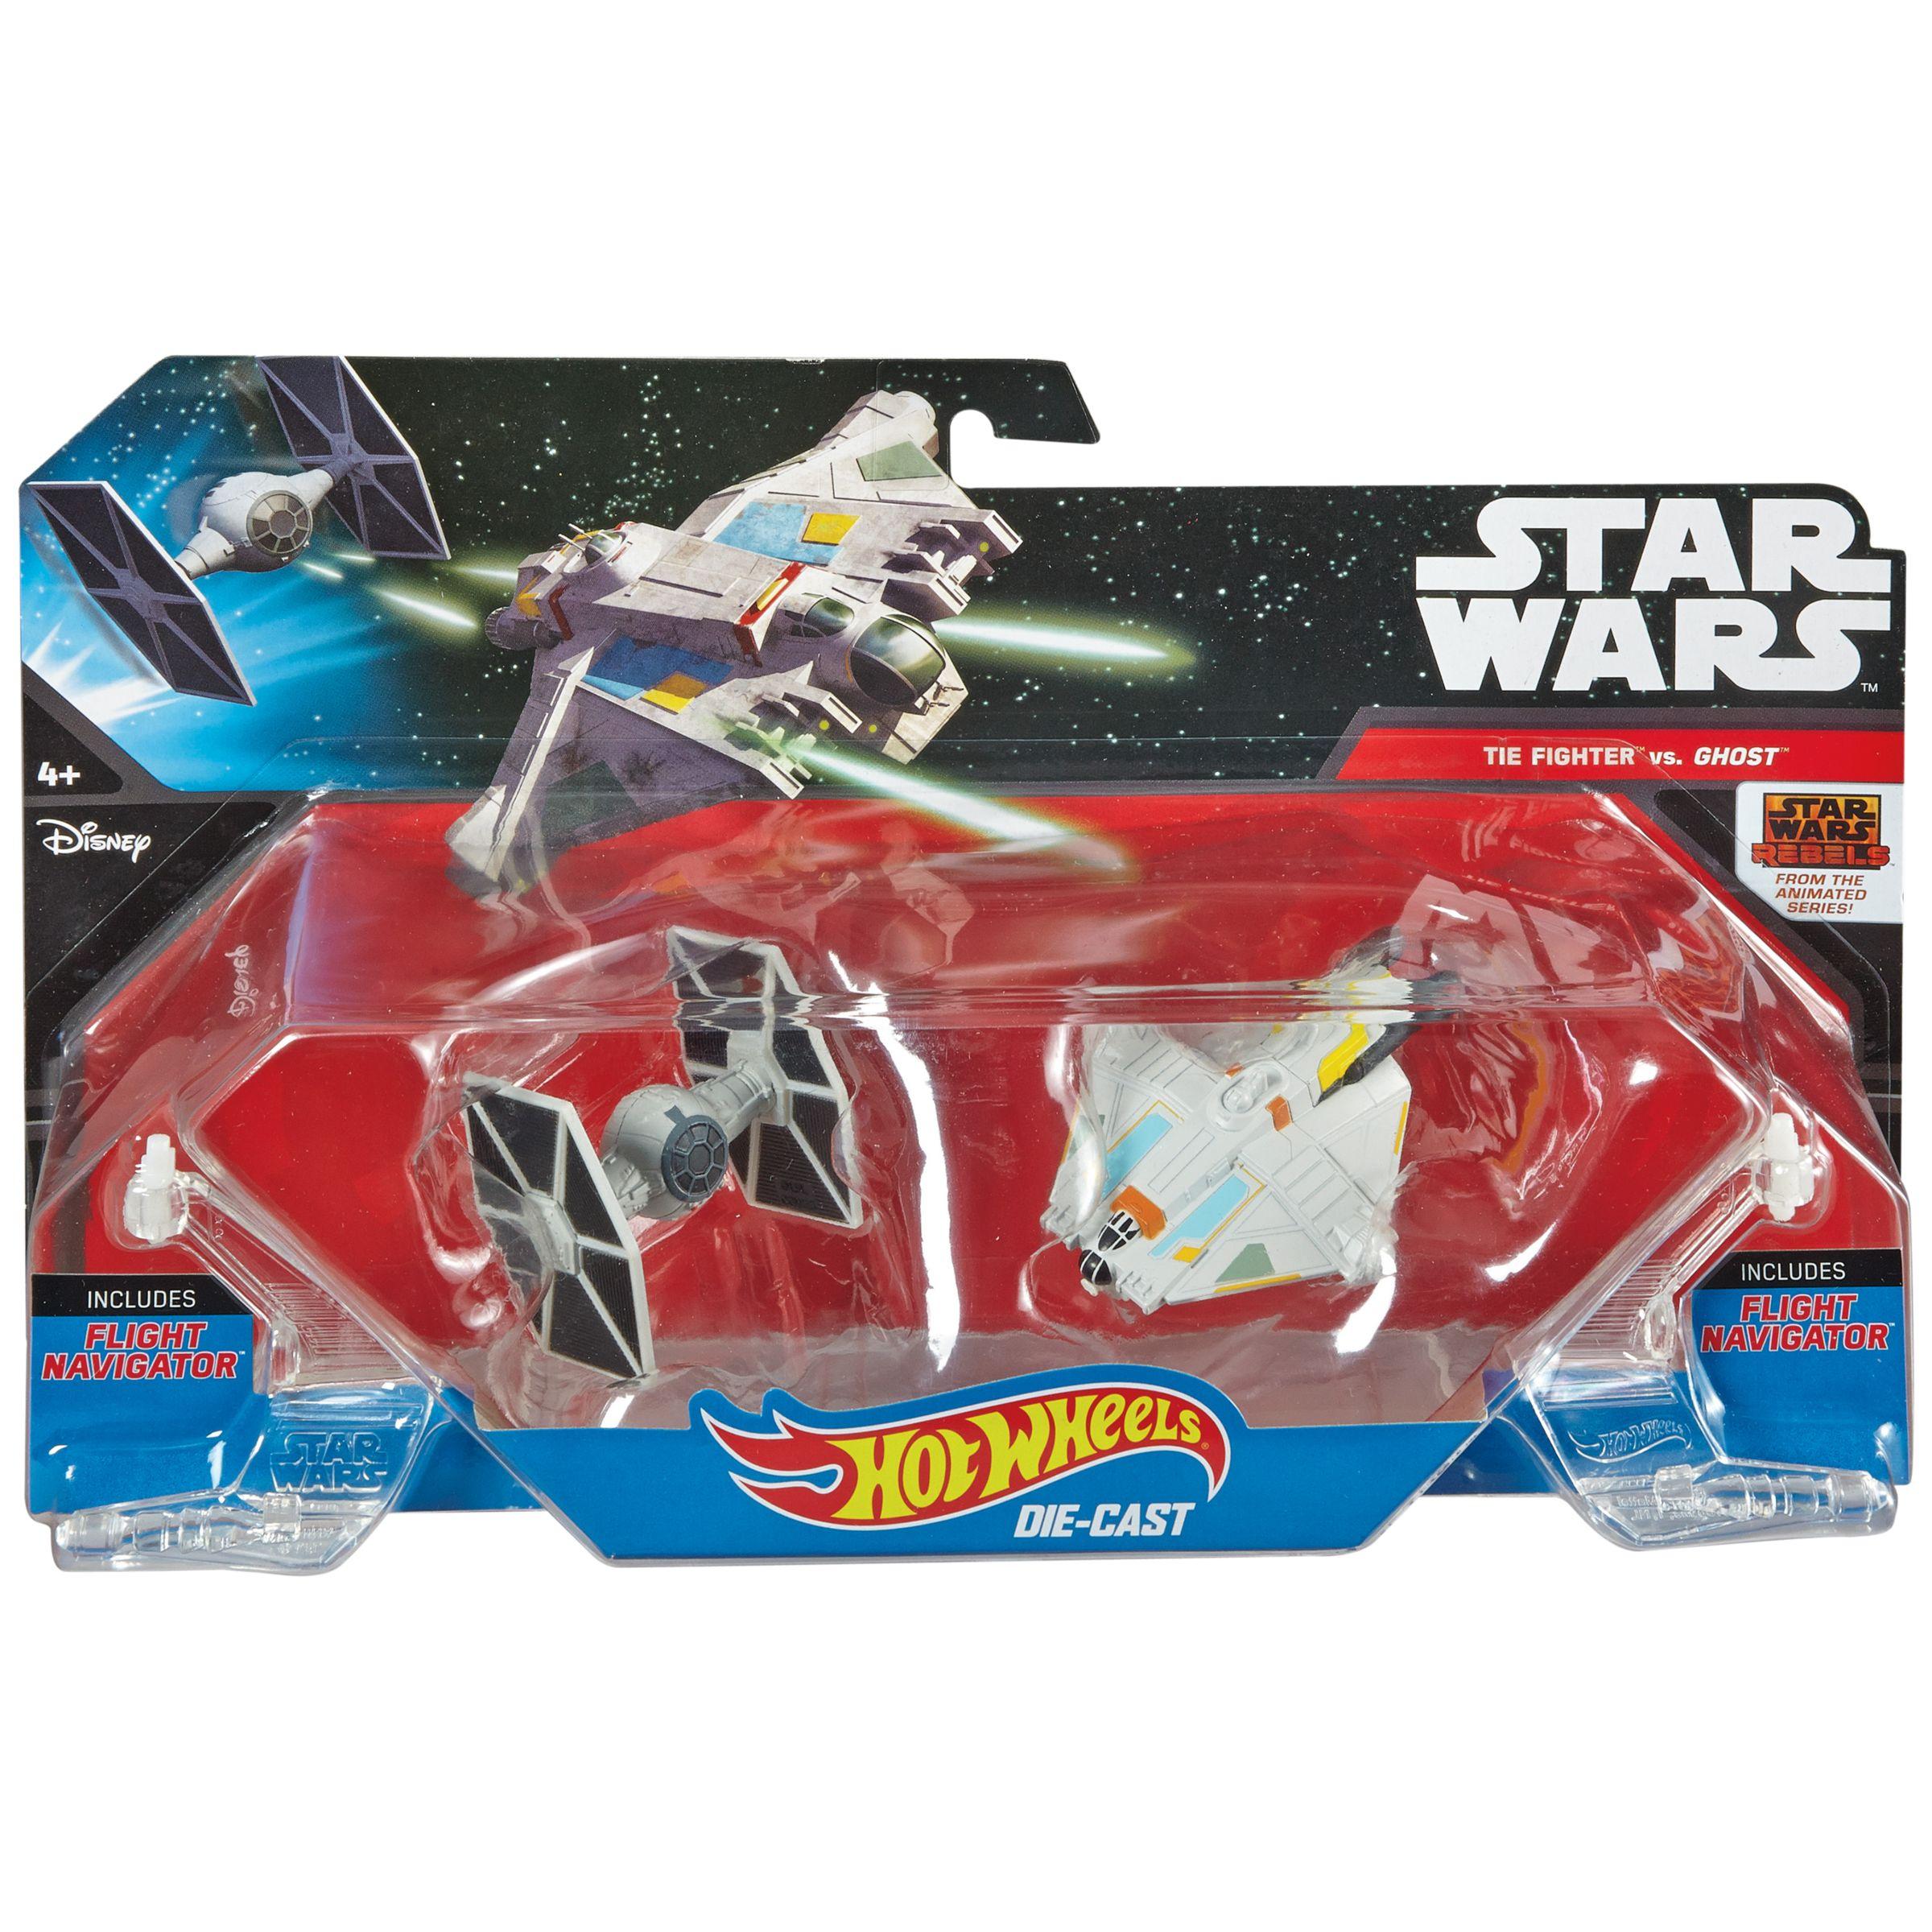 Hot Wheels Hot Wheels Star Wars Die-Cast Vehicles, Pack of 2, Assorted